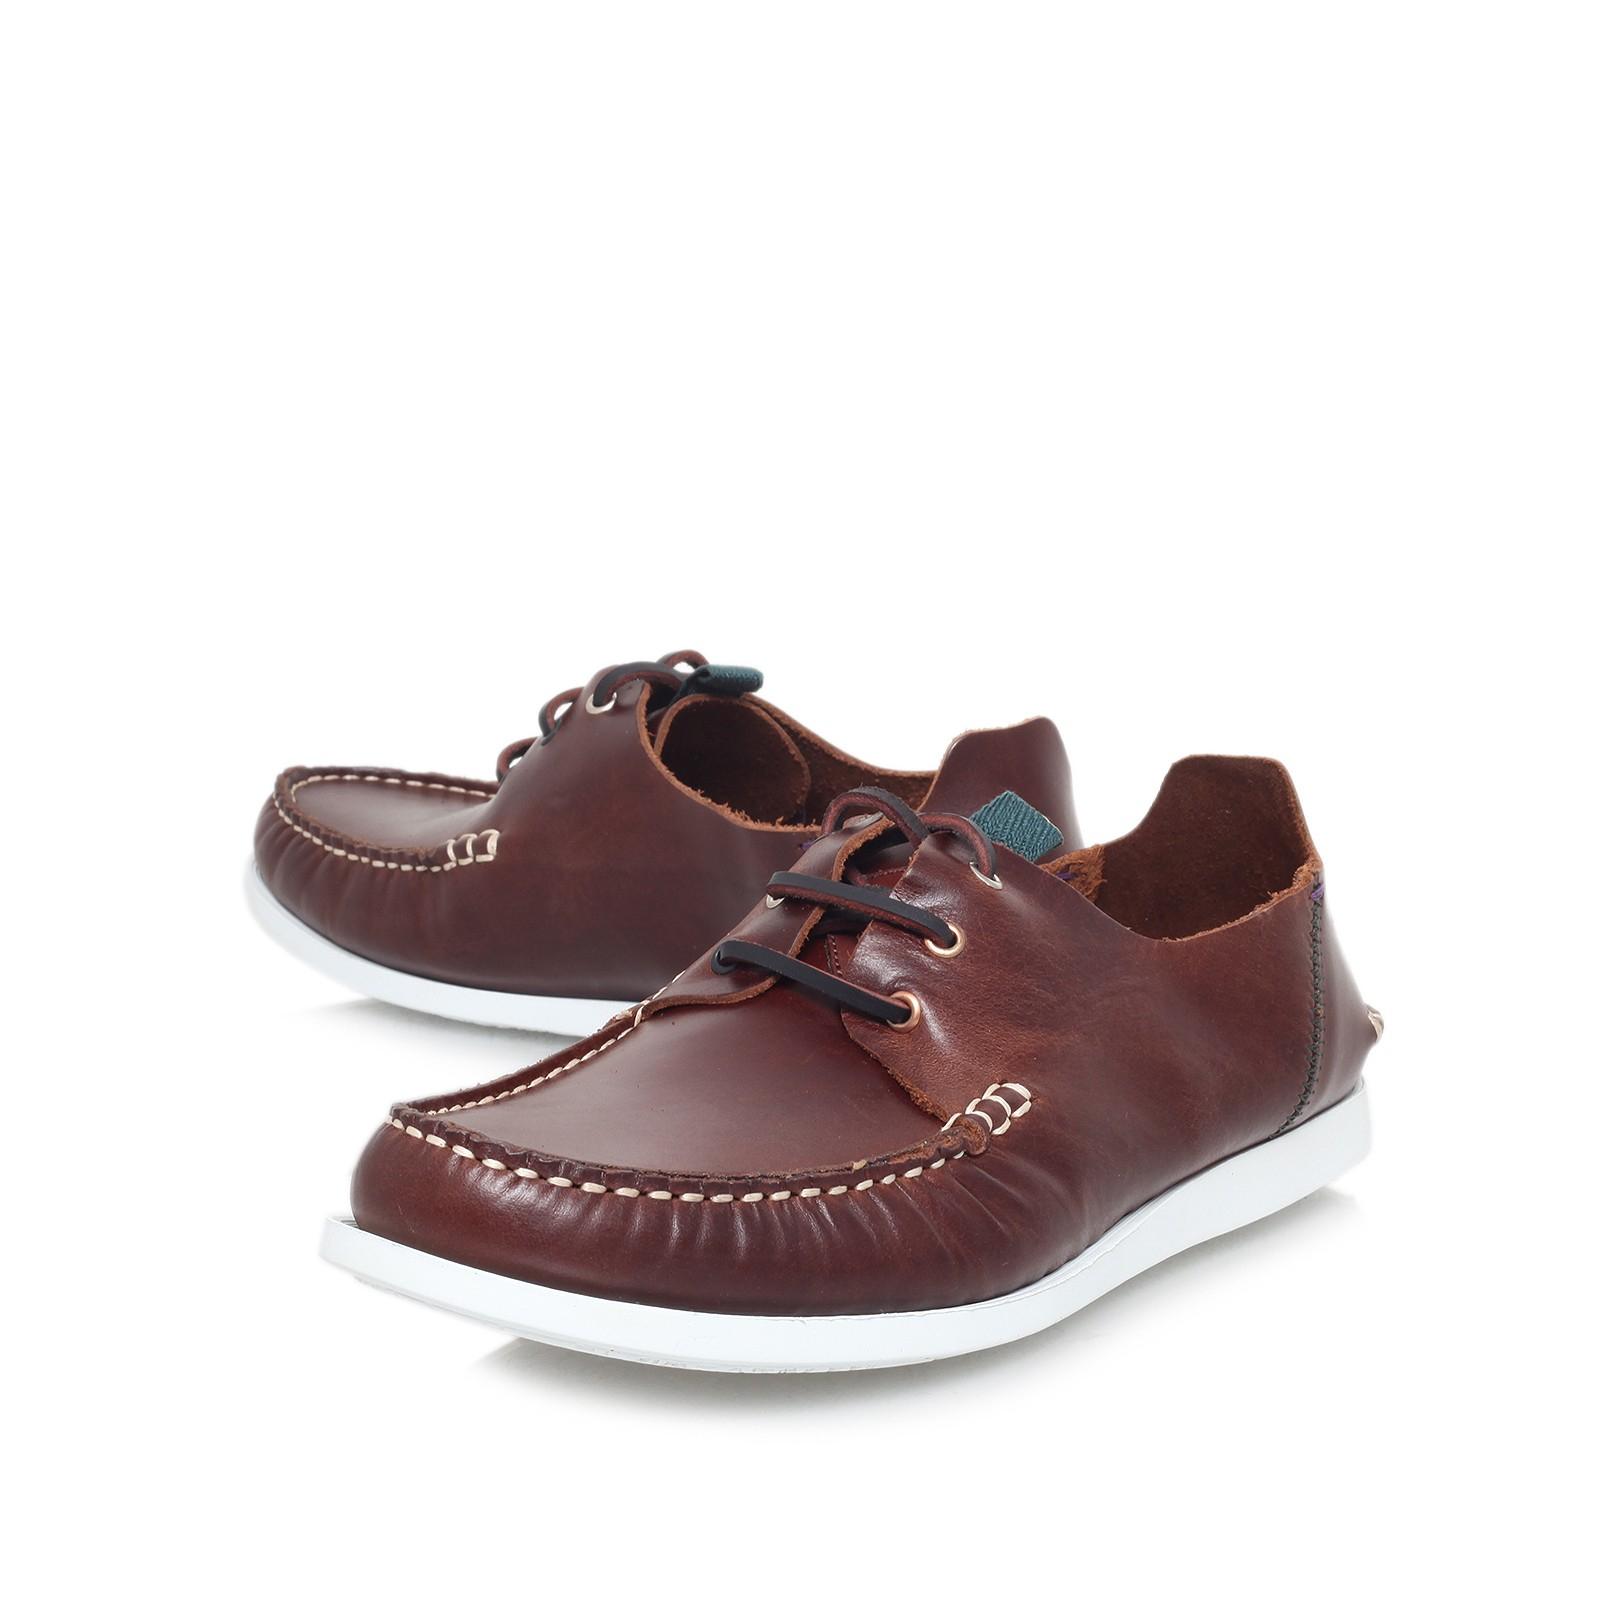 d96c75c9d53 Paul Smith Dagama Boat Shoe in Brown for Men - Lyst